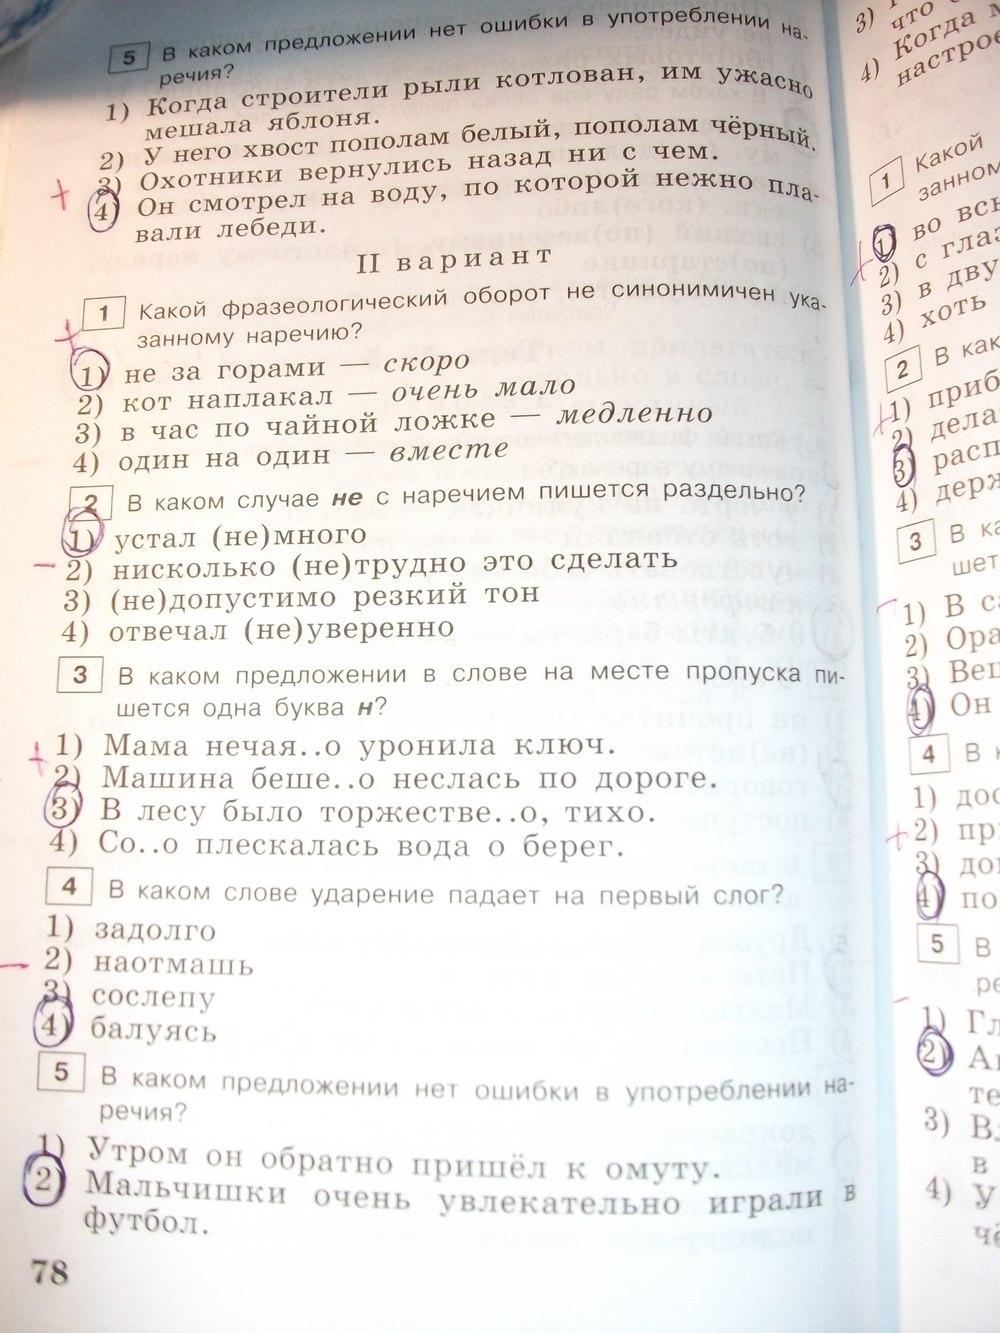 гдз по русскому стр 78